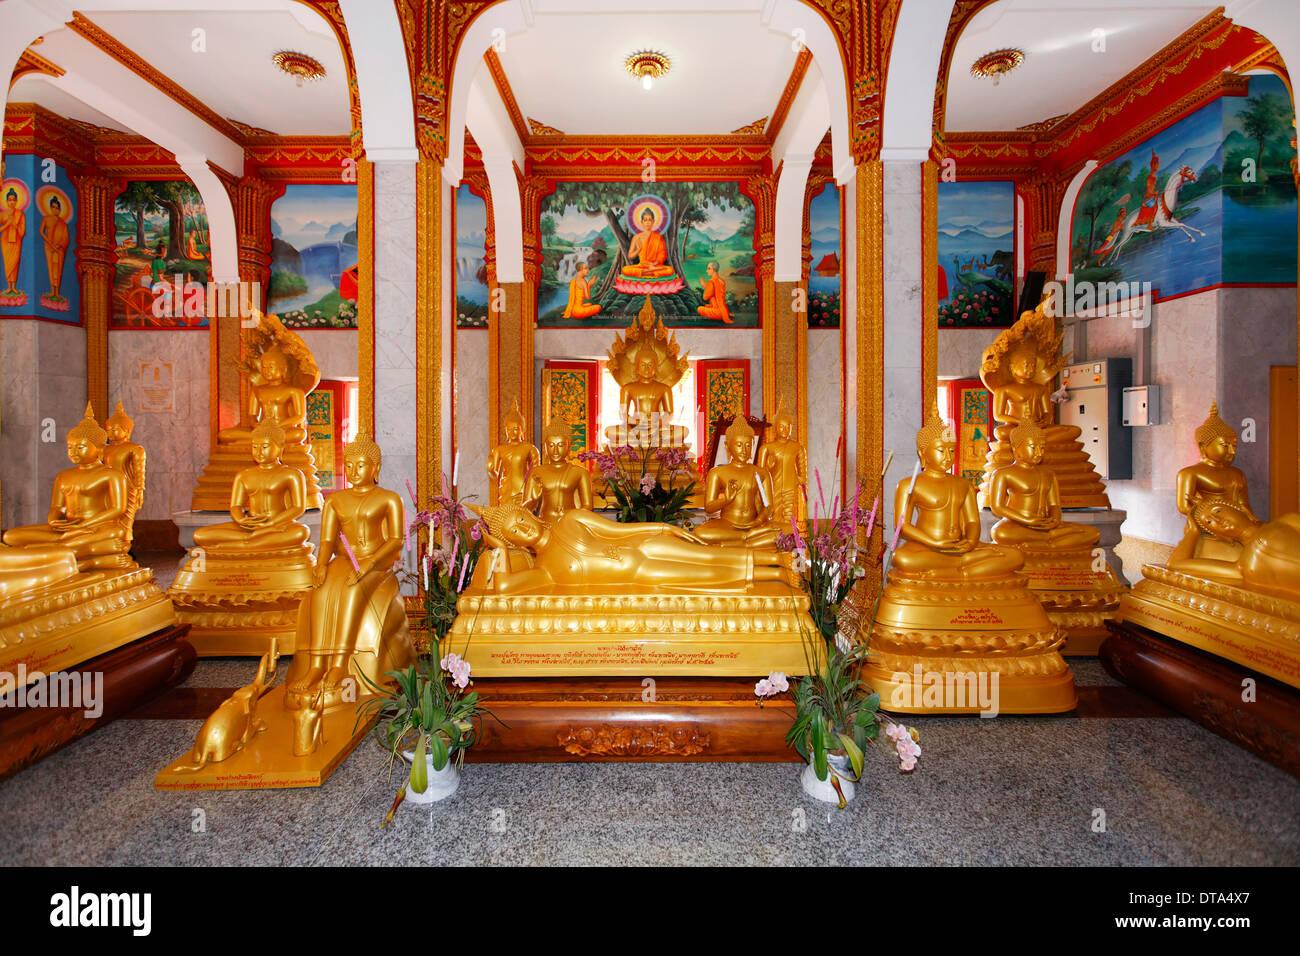 Gilded Buddha statues and reclining Buddhas, Wat Chalong temple, Phuket, Thailand - Stock Image